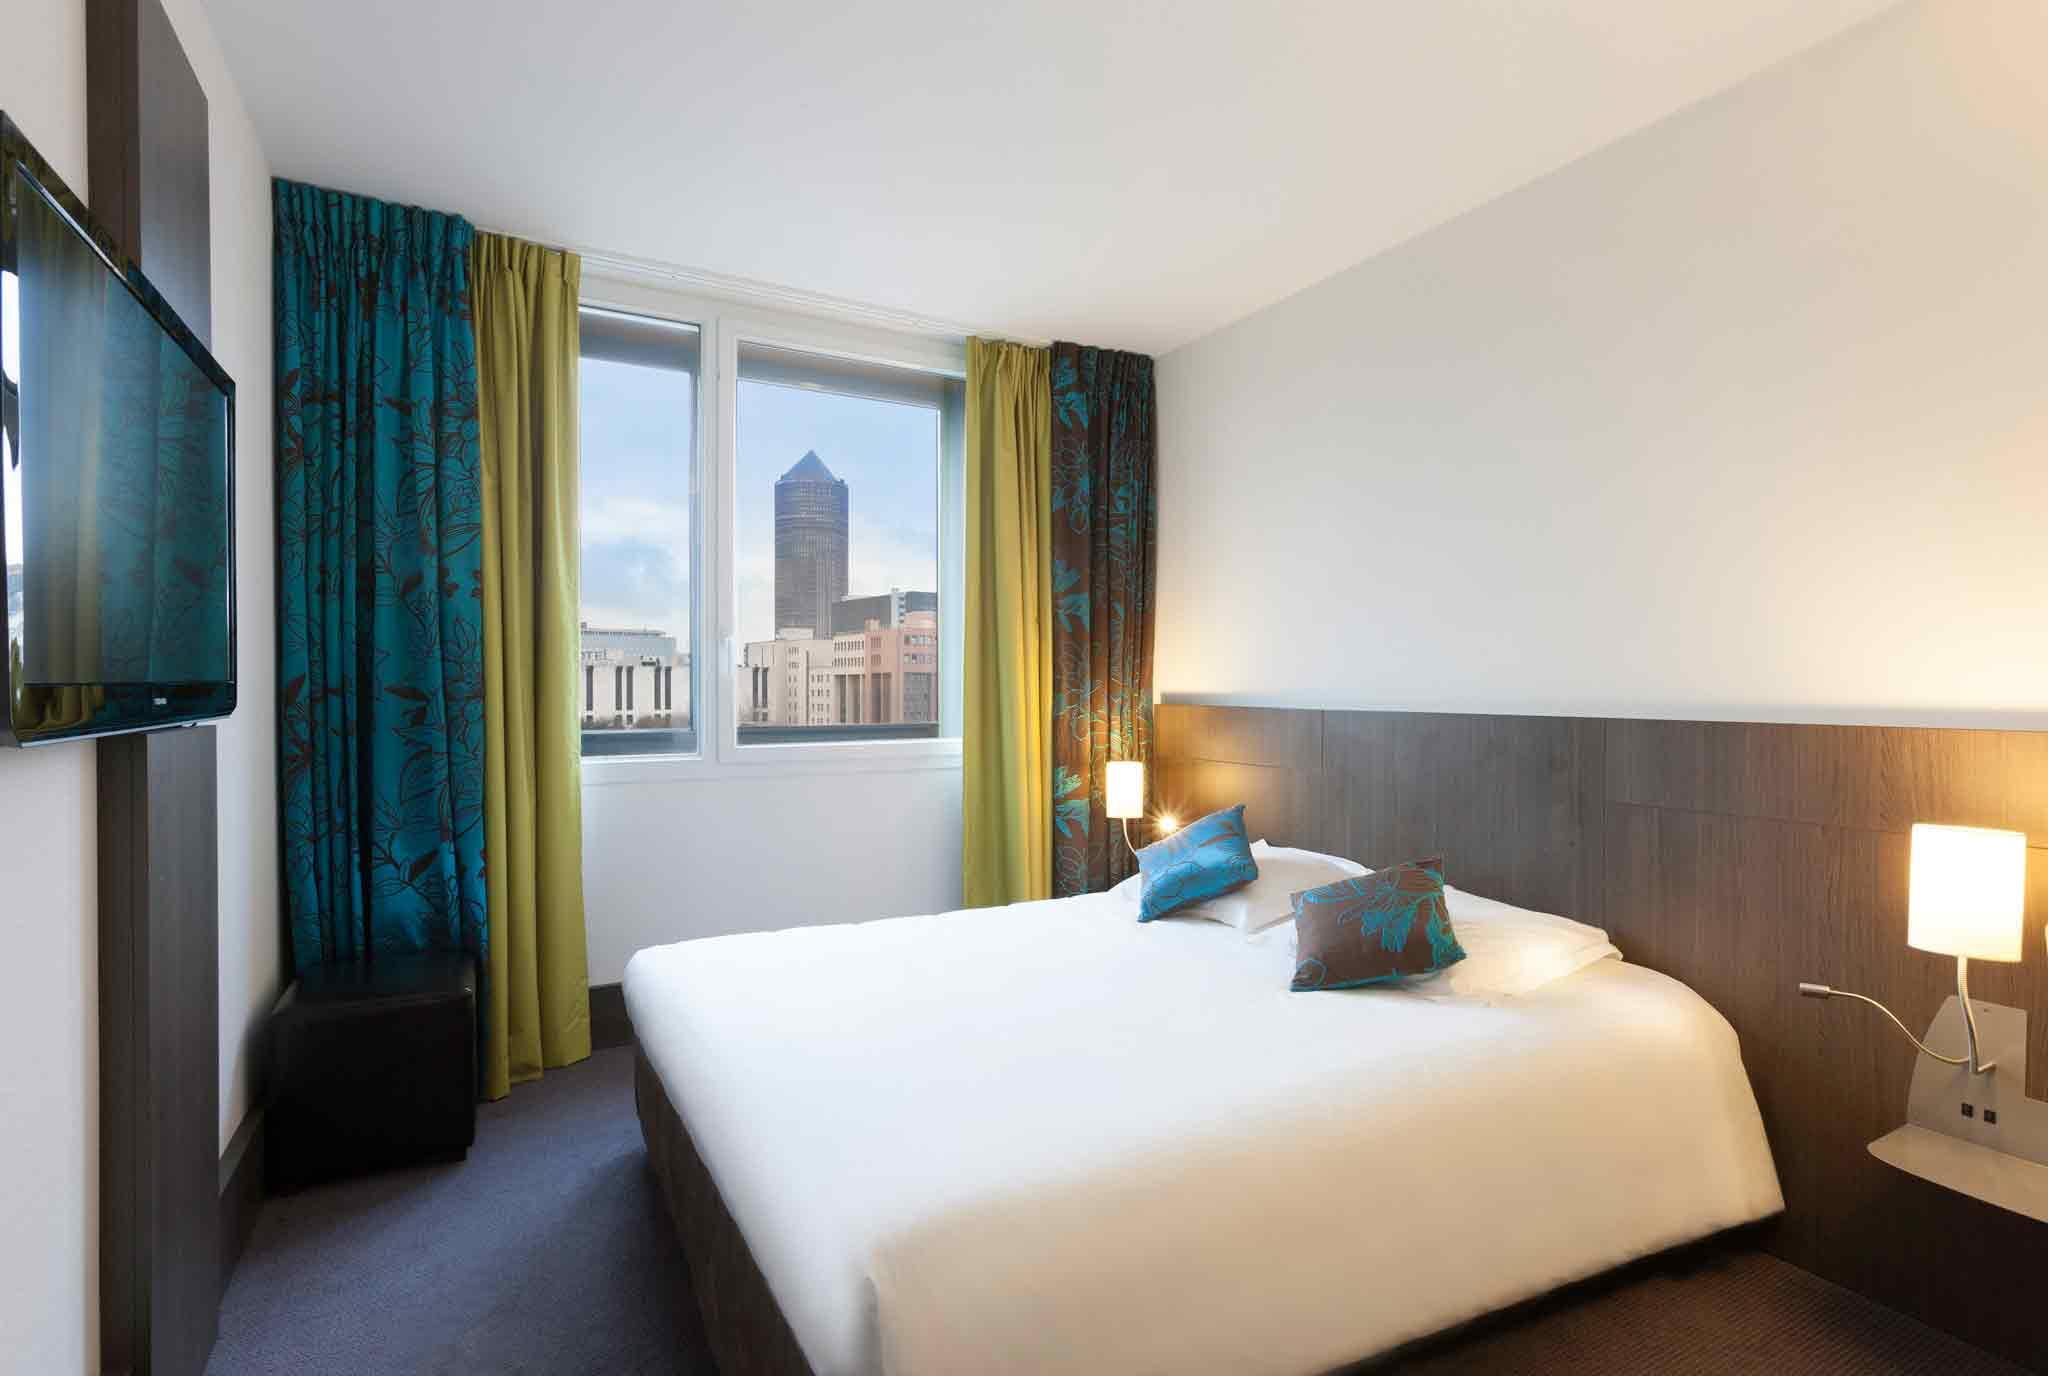 Hotel Ibis Lyon La Part Dieu